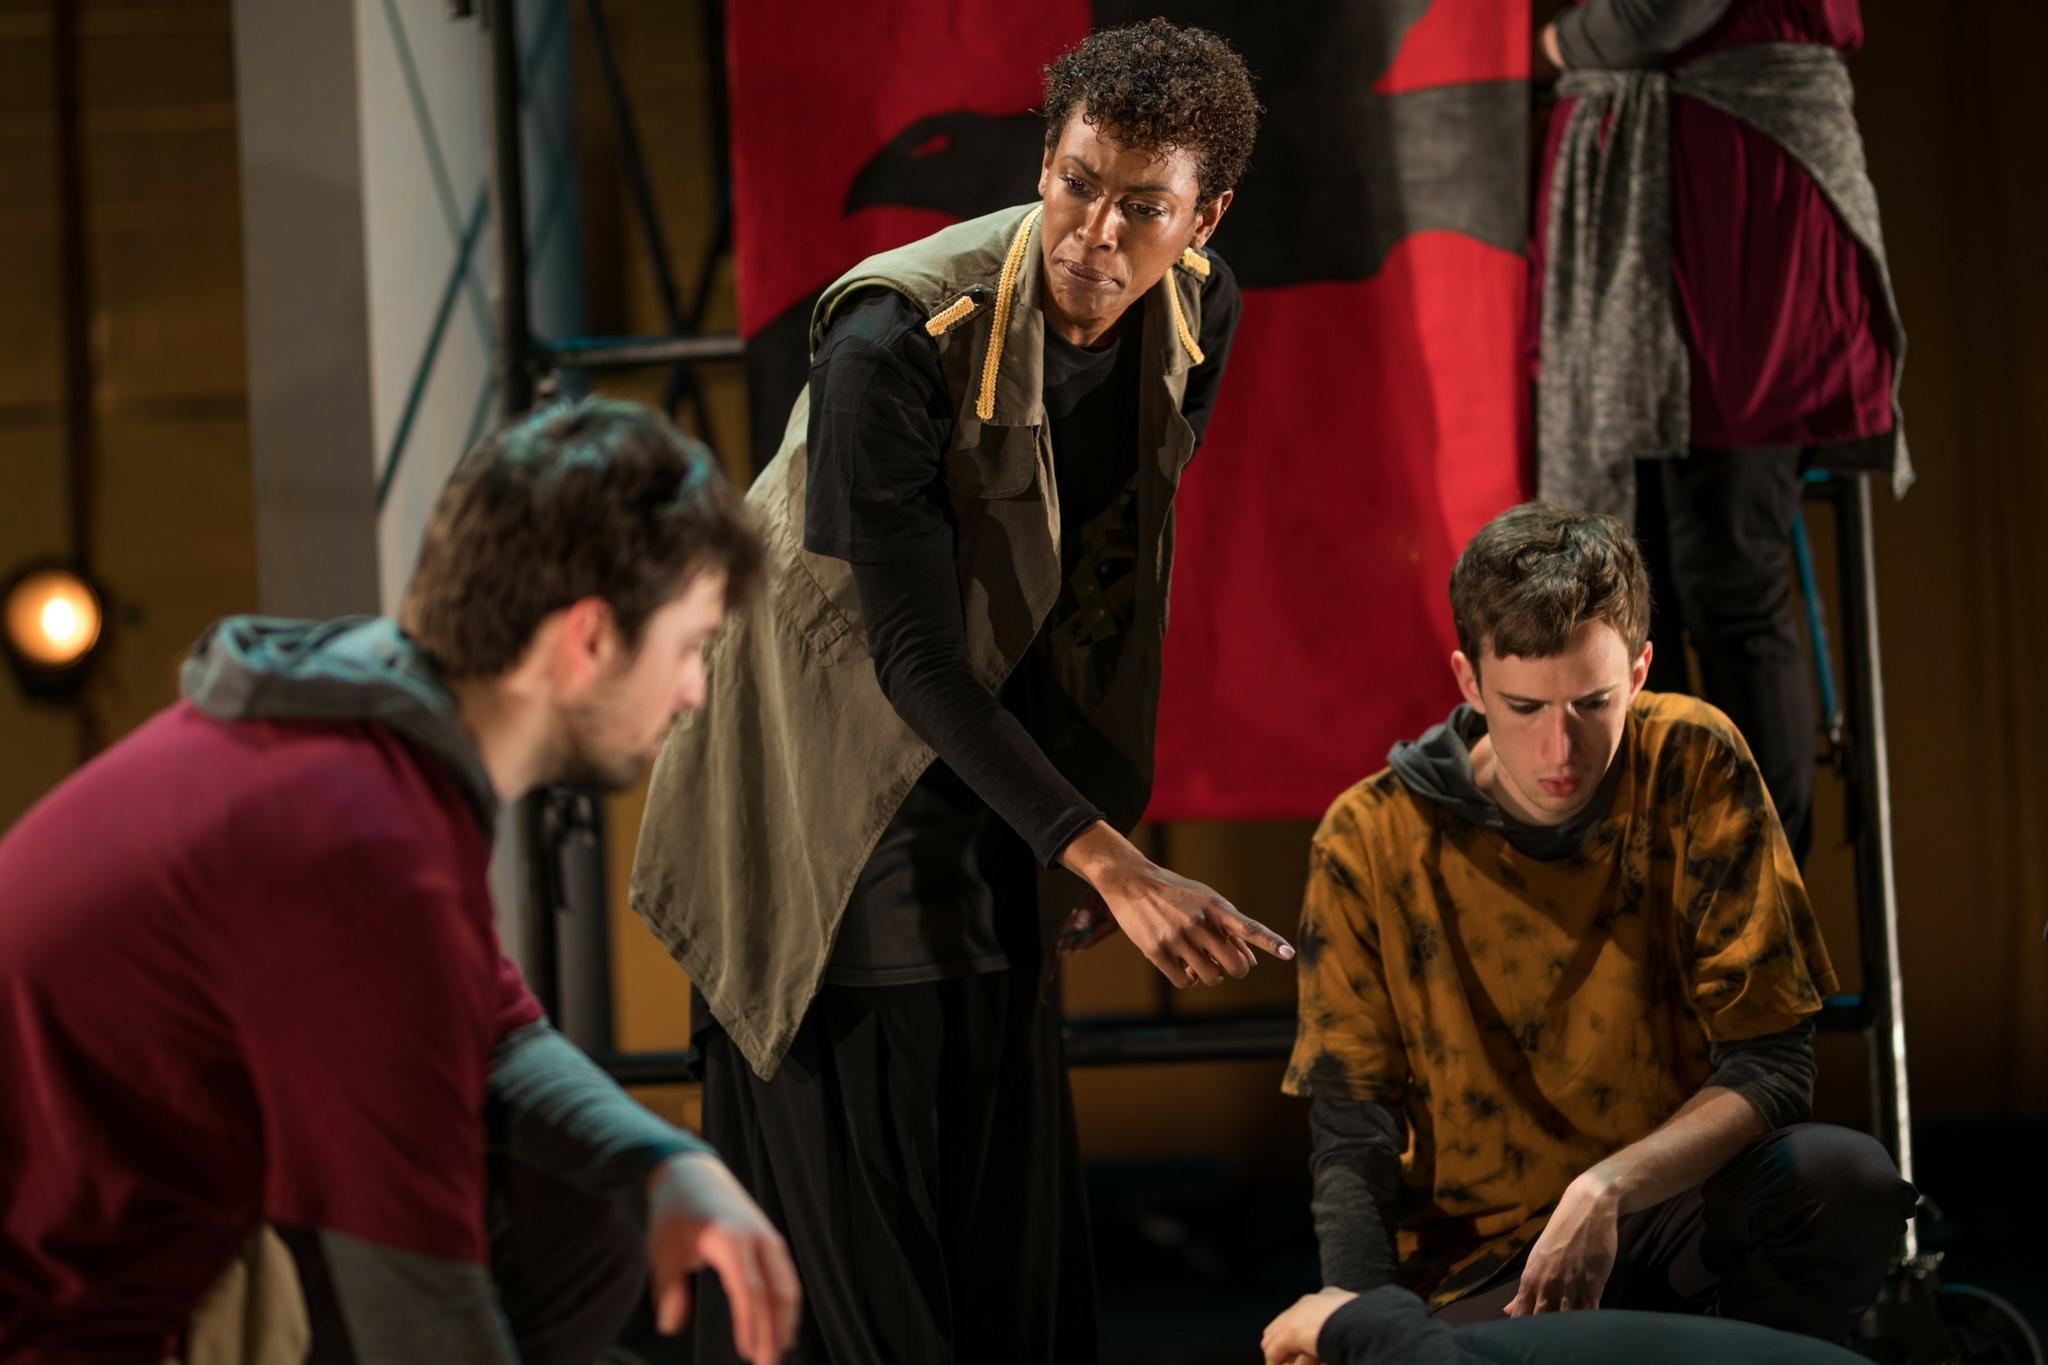 Alex Deroo (Metellus), Kaci Hamilton (Mark Antony), and Keith Hale (Caska) in Julius Caesar, CSC2, 2017-Photo by Nile Hawver